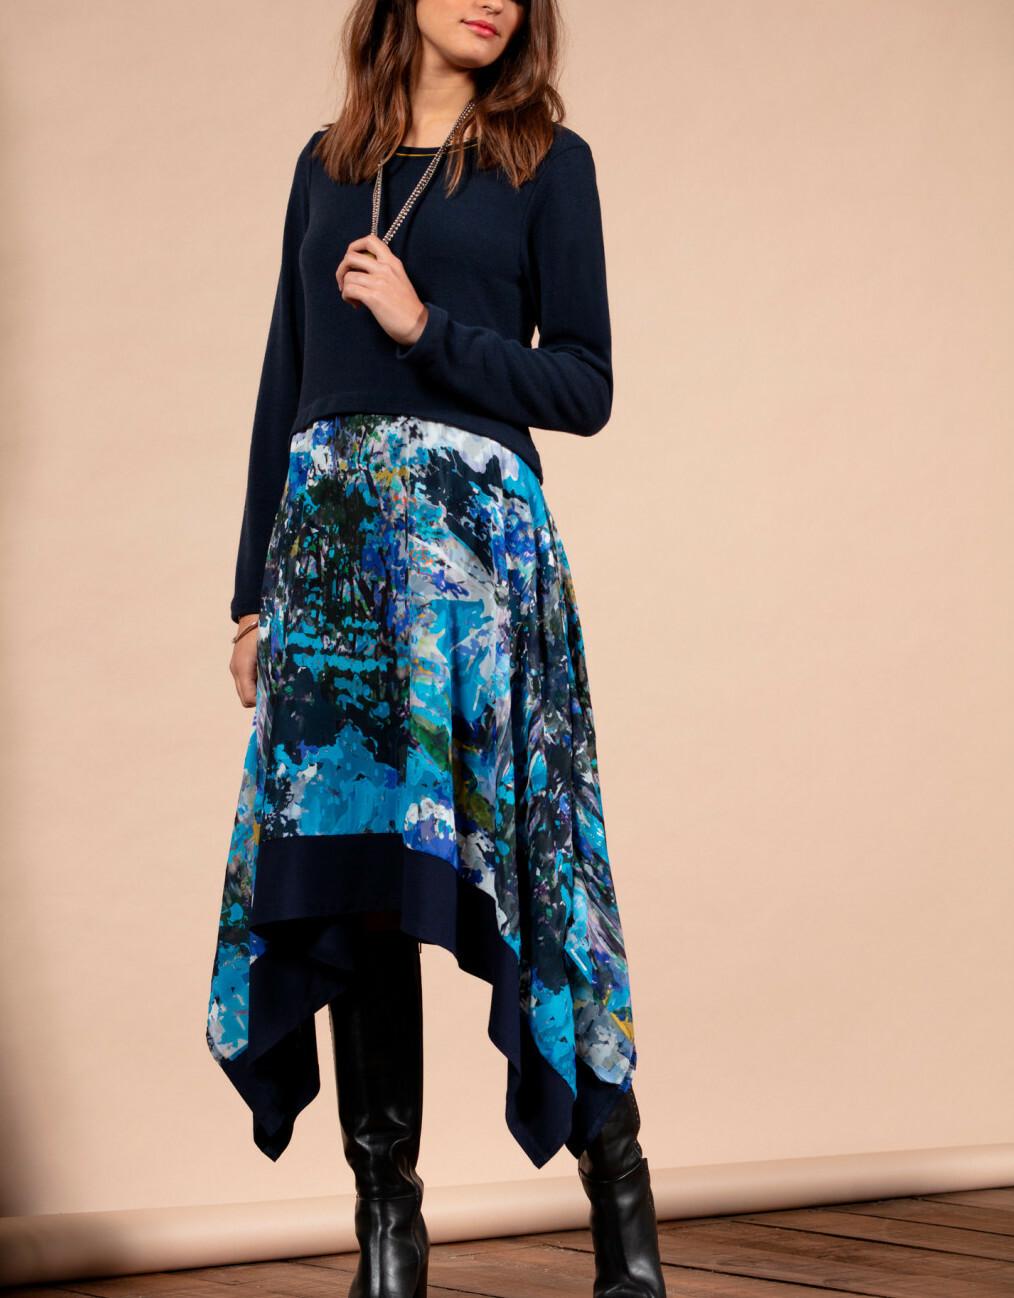 Maloka: Blue Beauty Abstract Art Asymmetrical Sweater Dress (More Colors!) MK_BABILONE